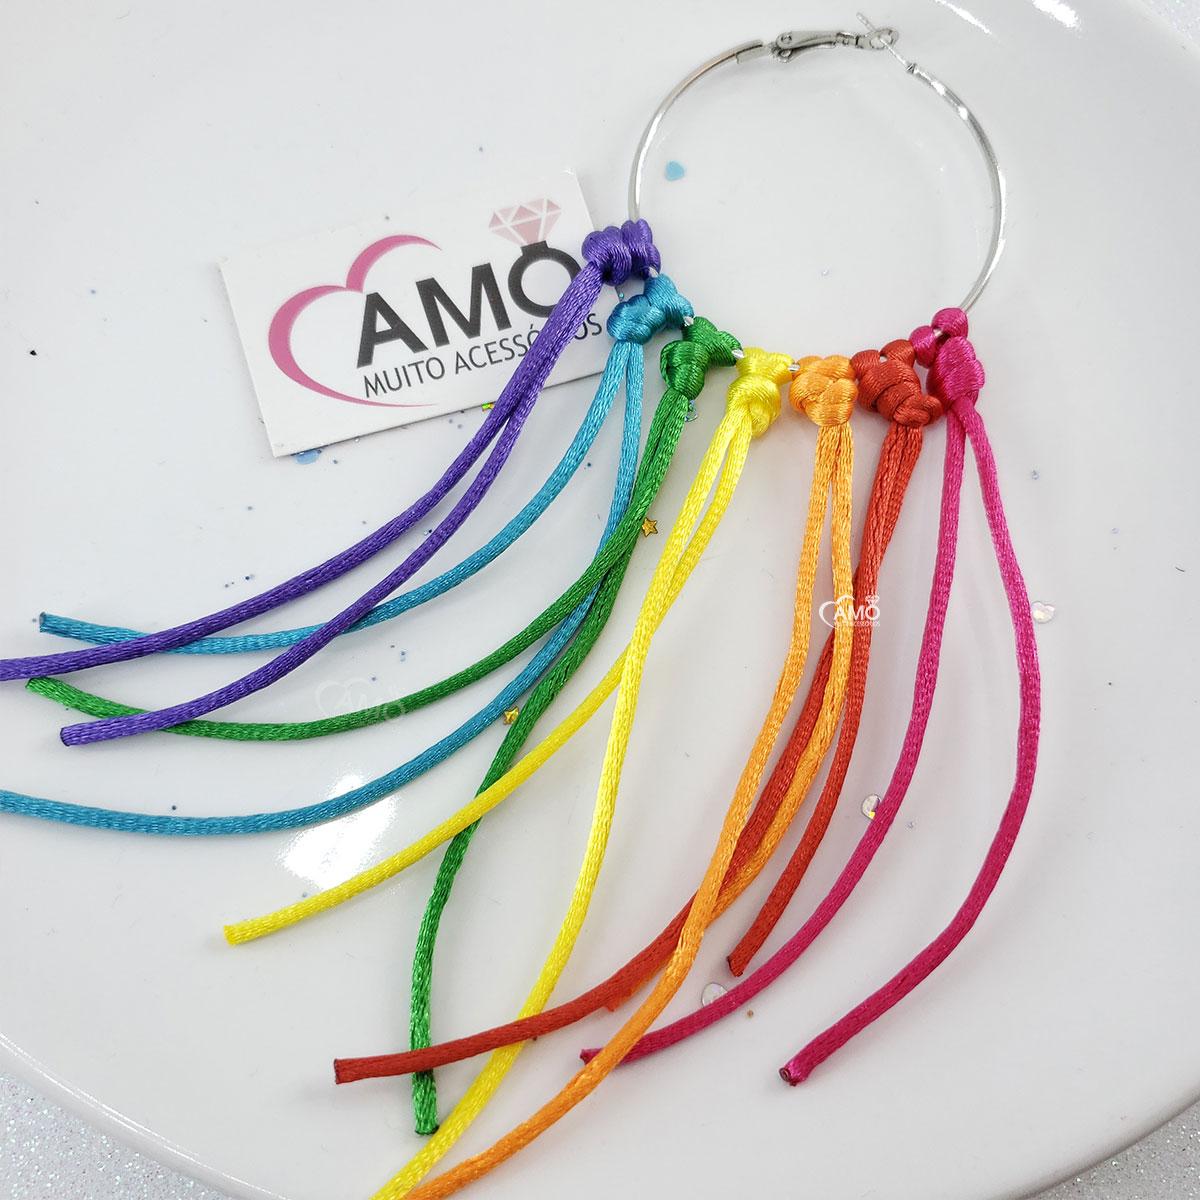 Brinco Fitas Argola Colorido - Carnaval